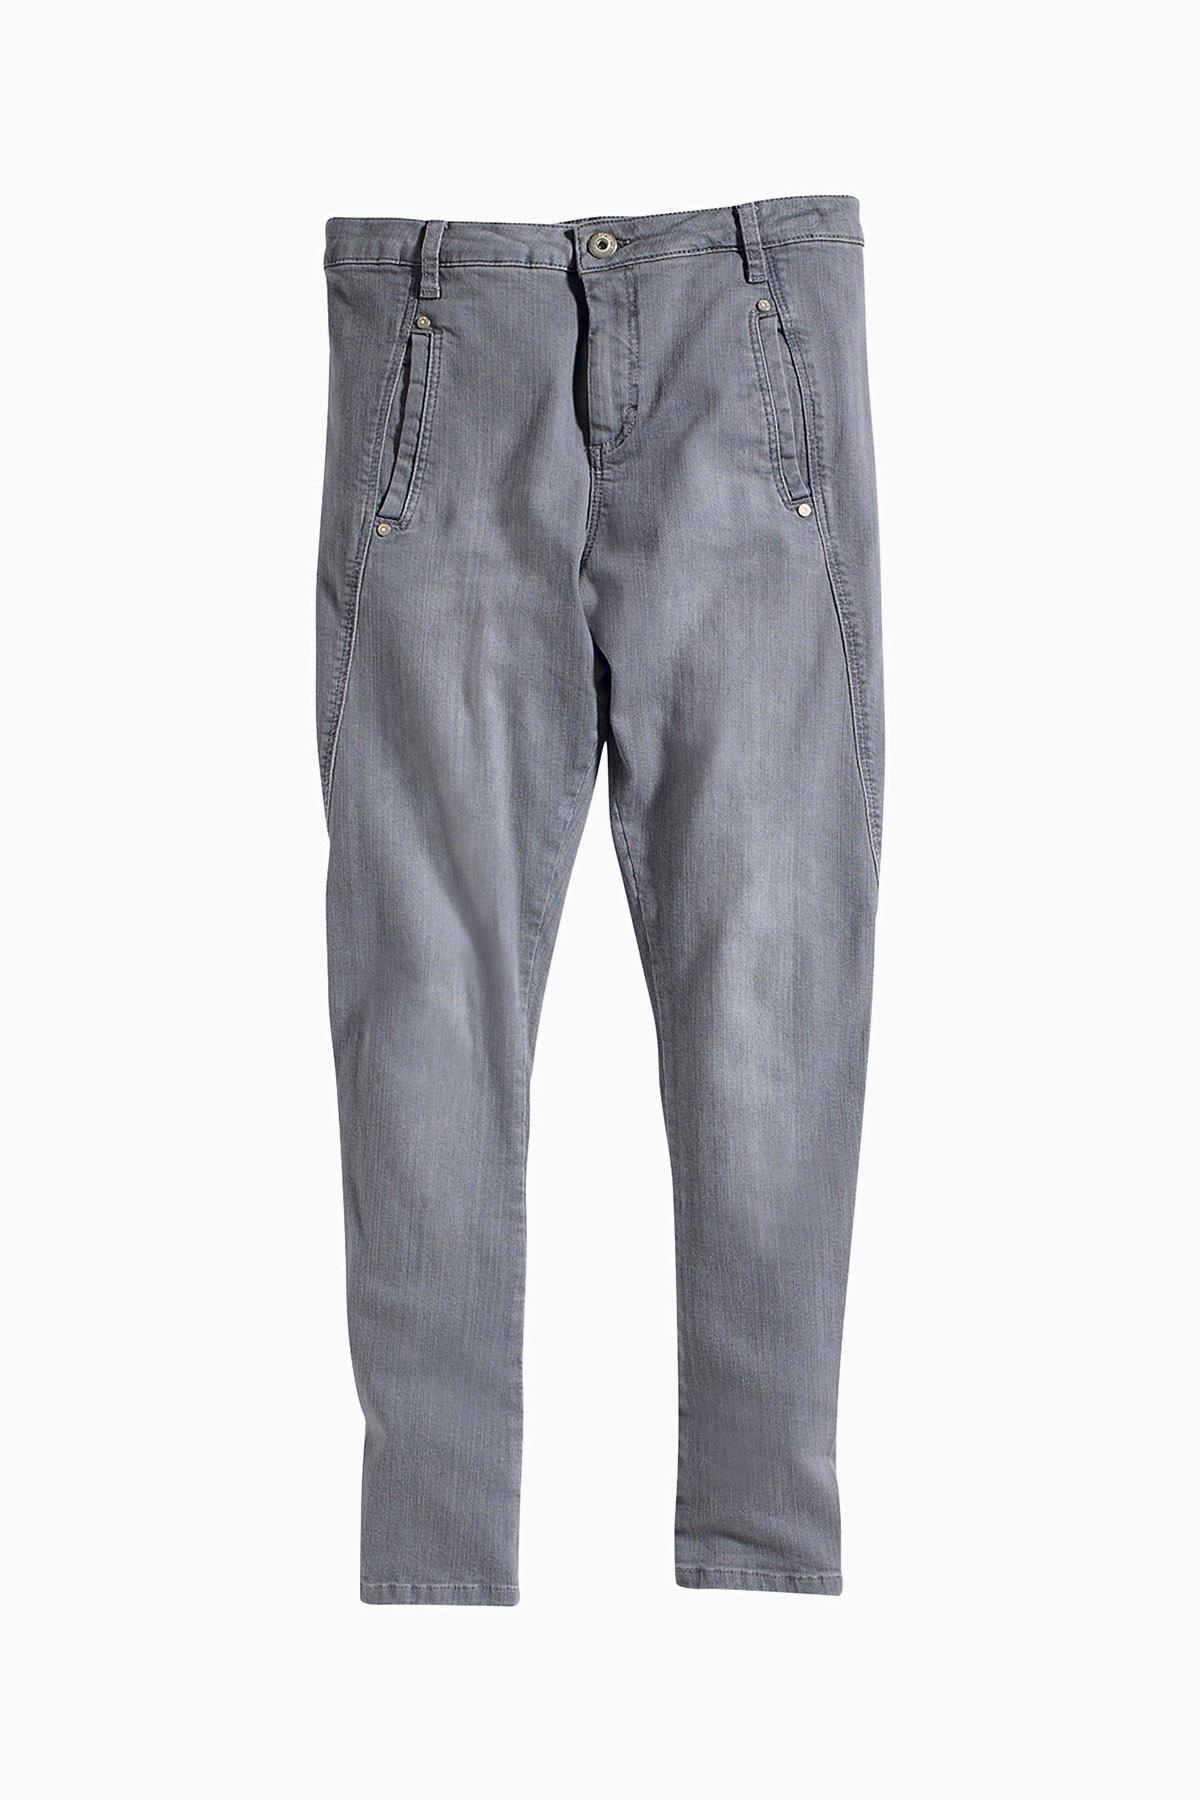 Image of BonA Parte Dame Jeans - Grå